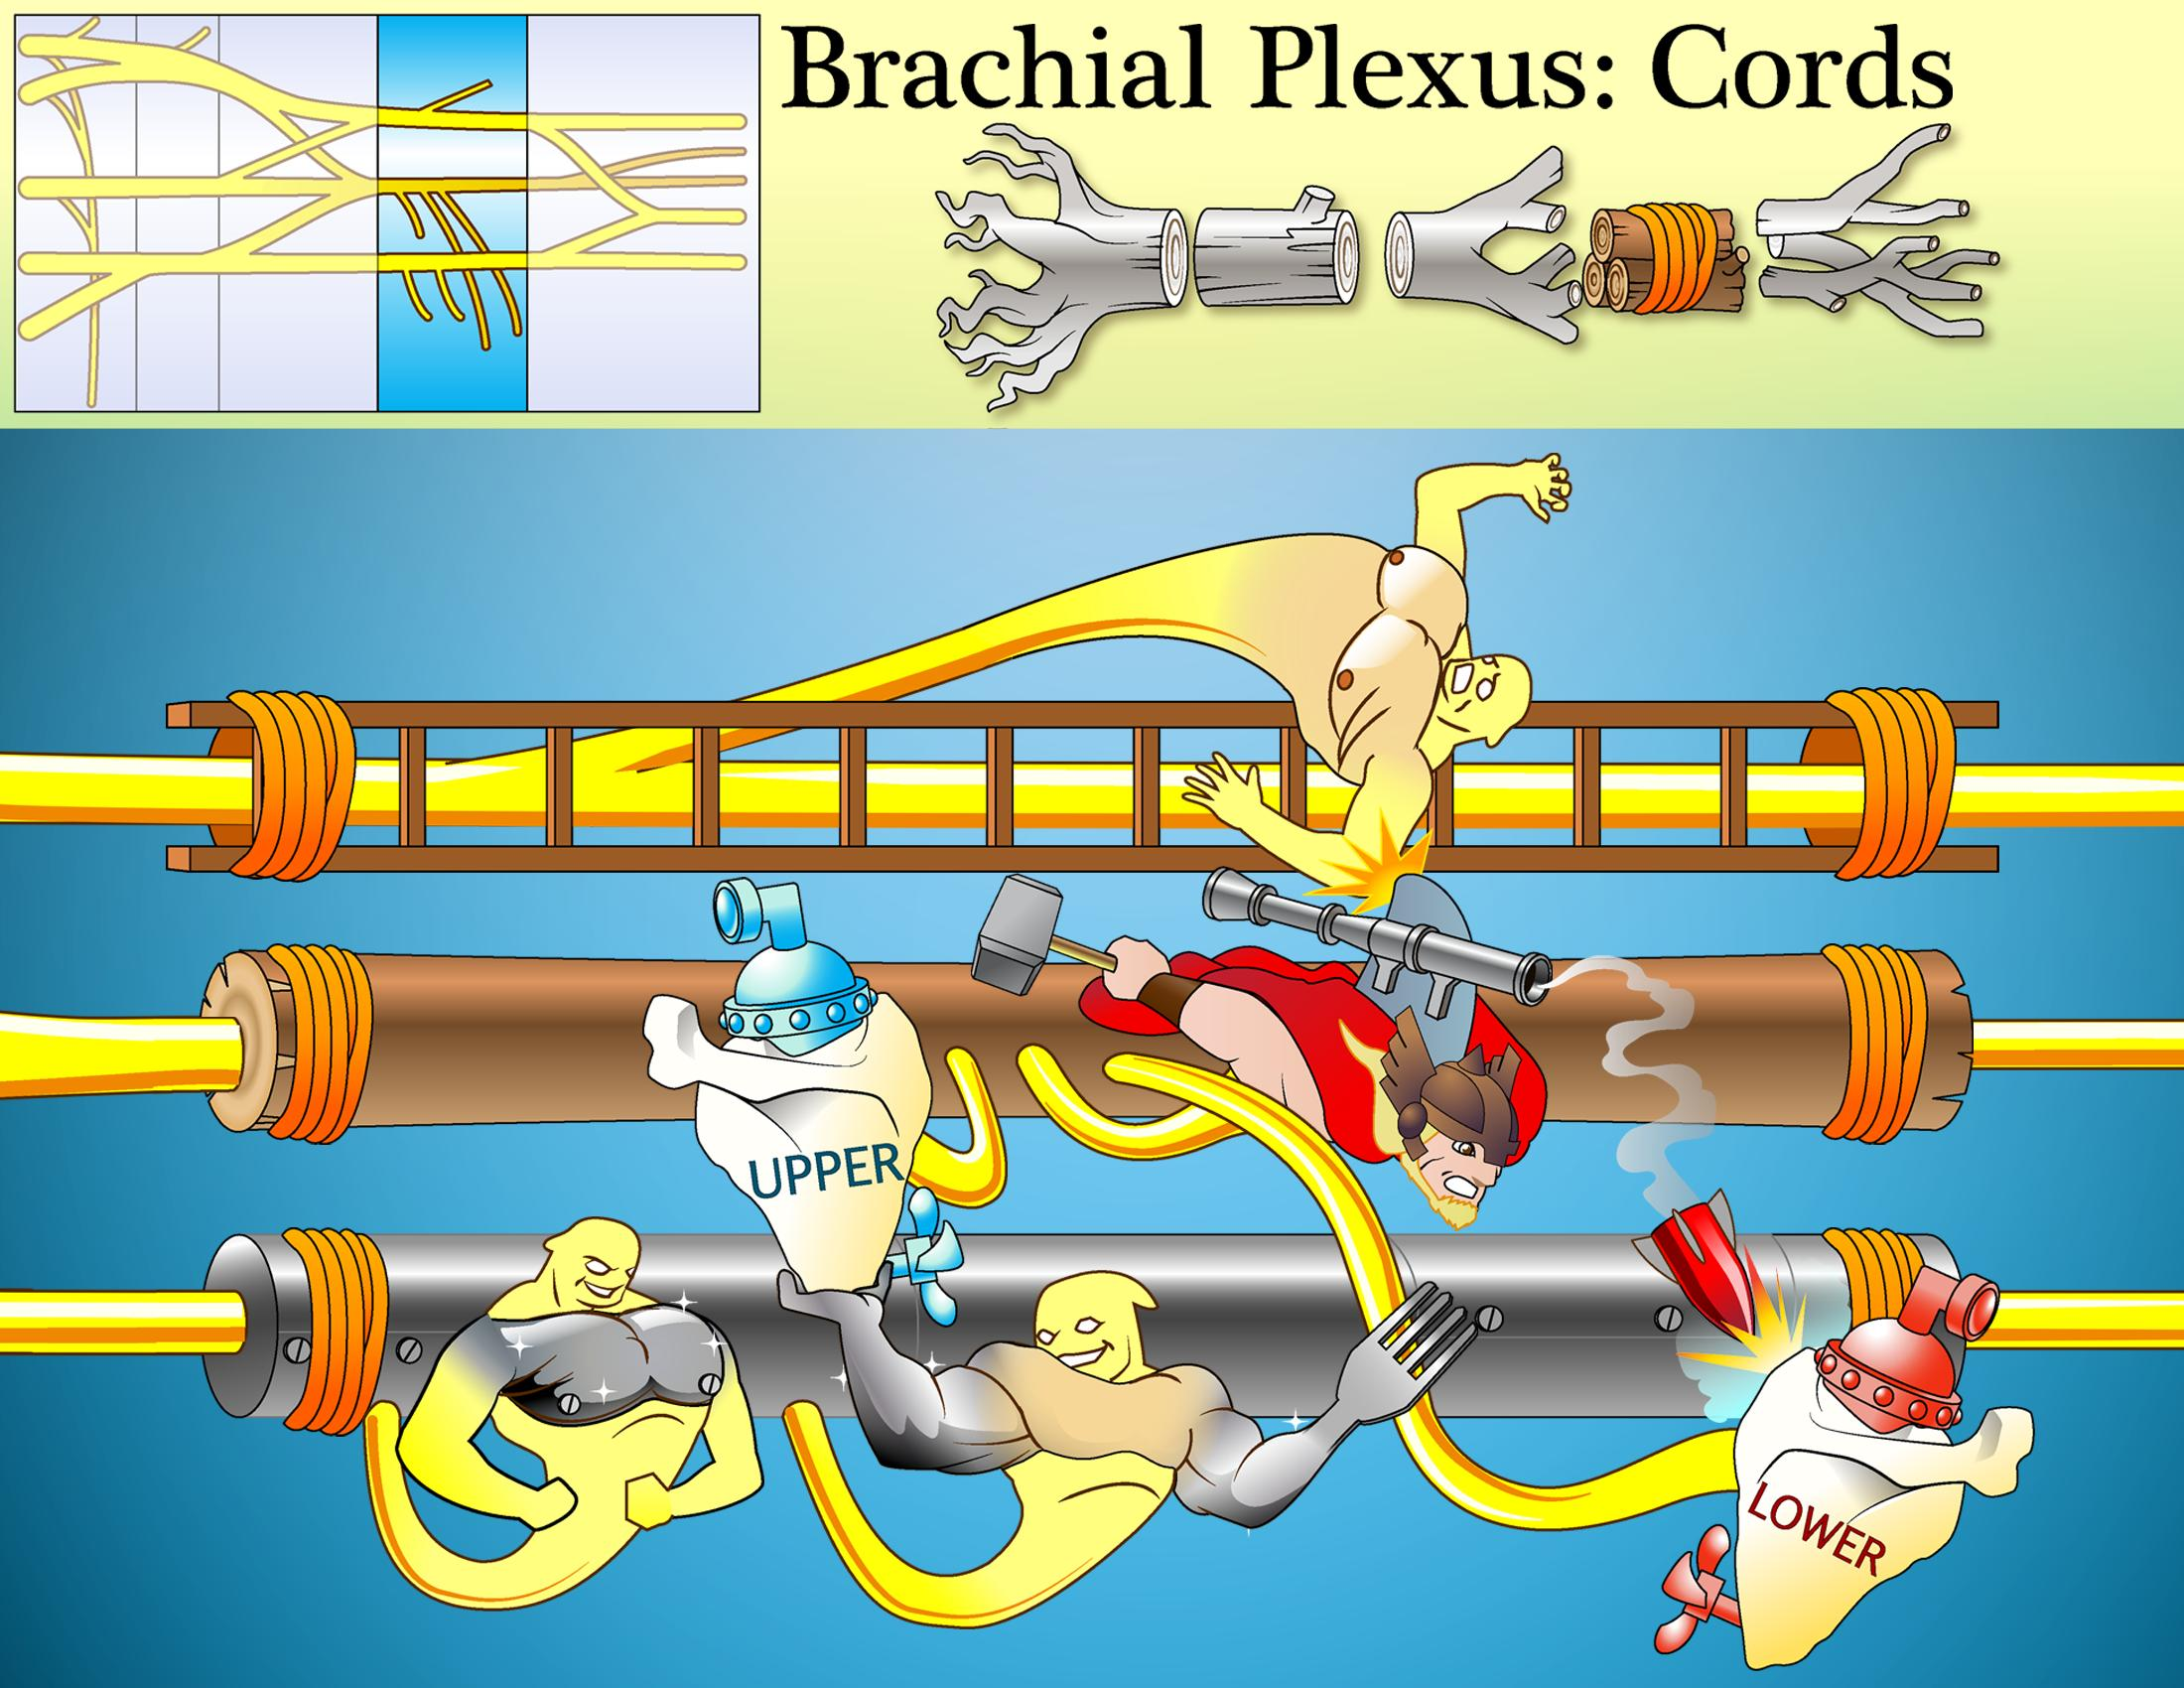 Brachial Plexus Cords